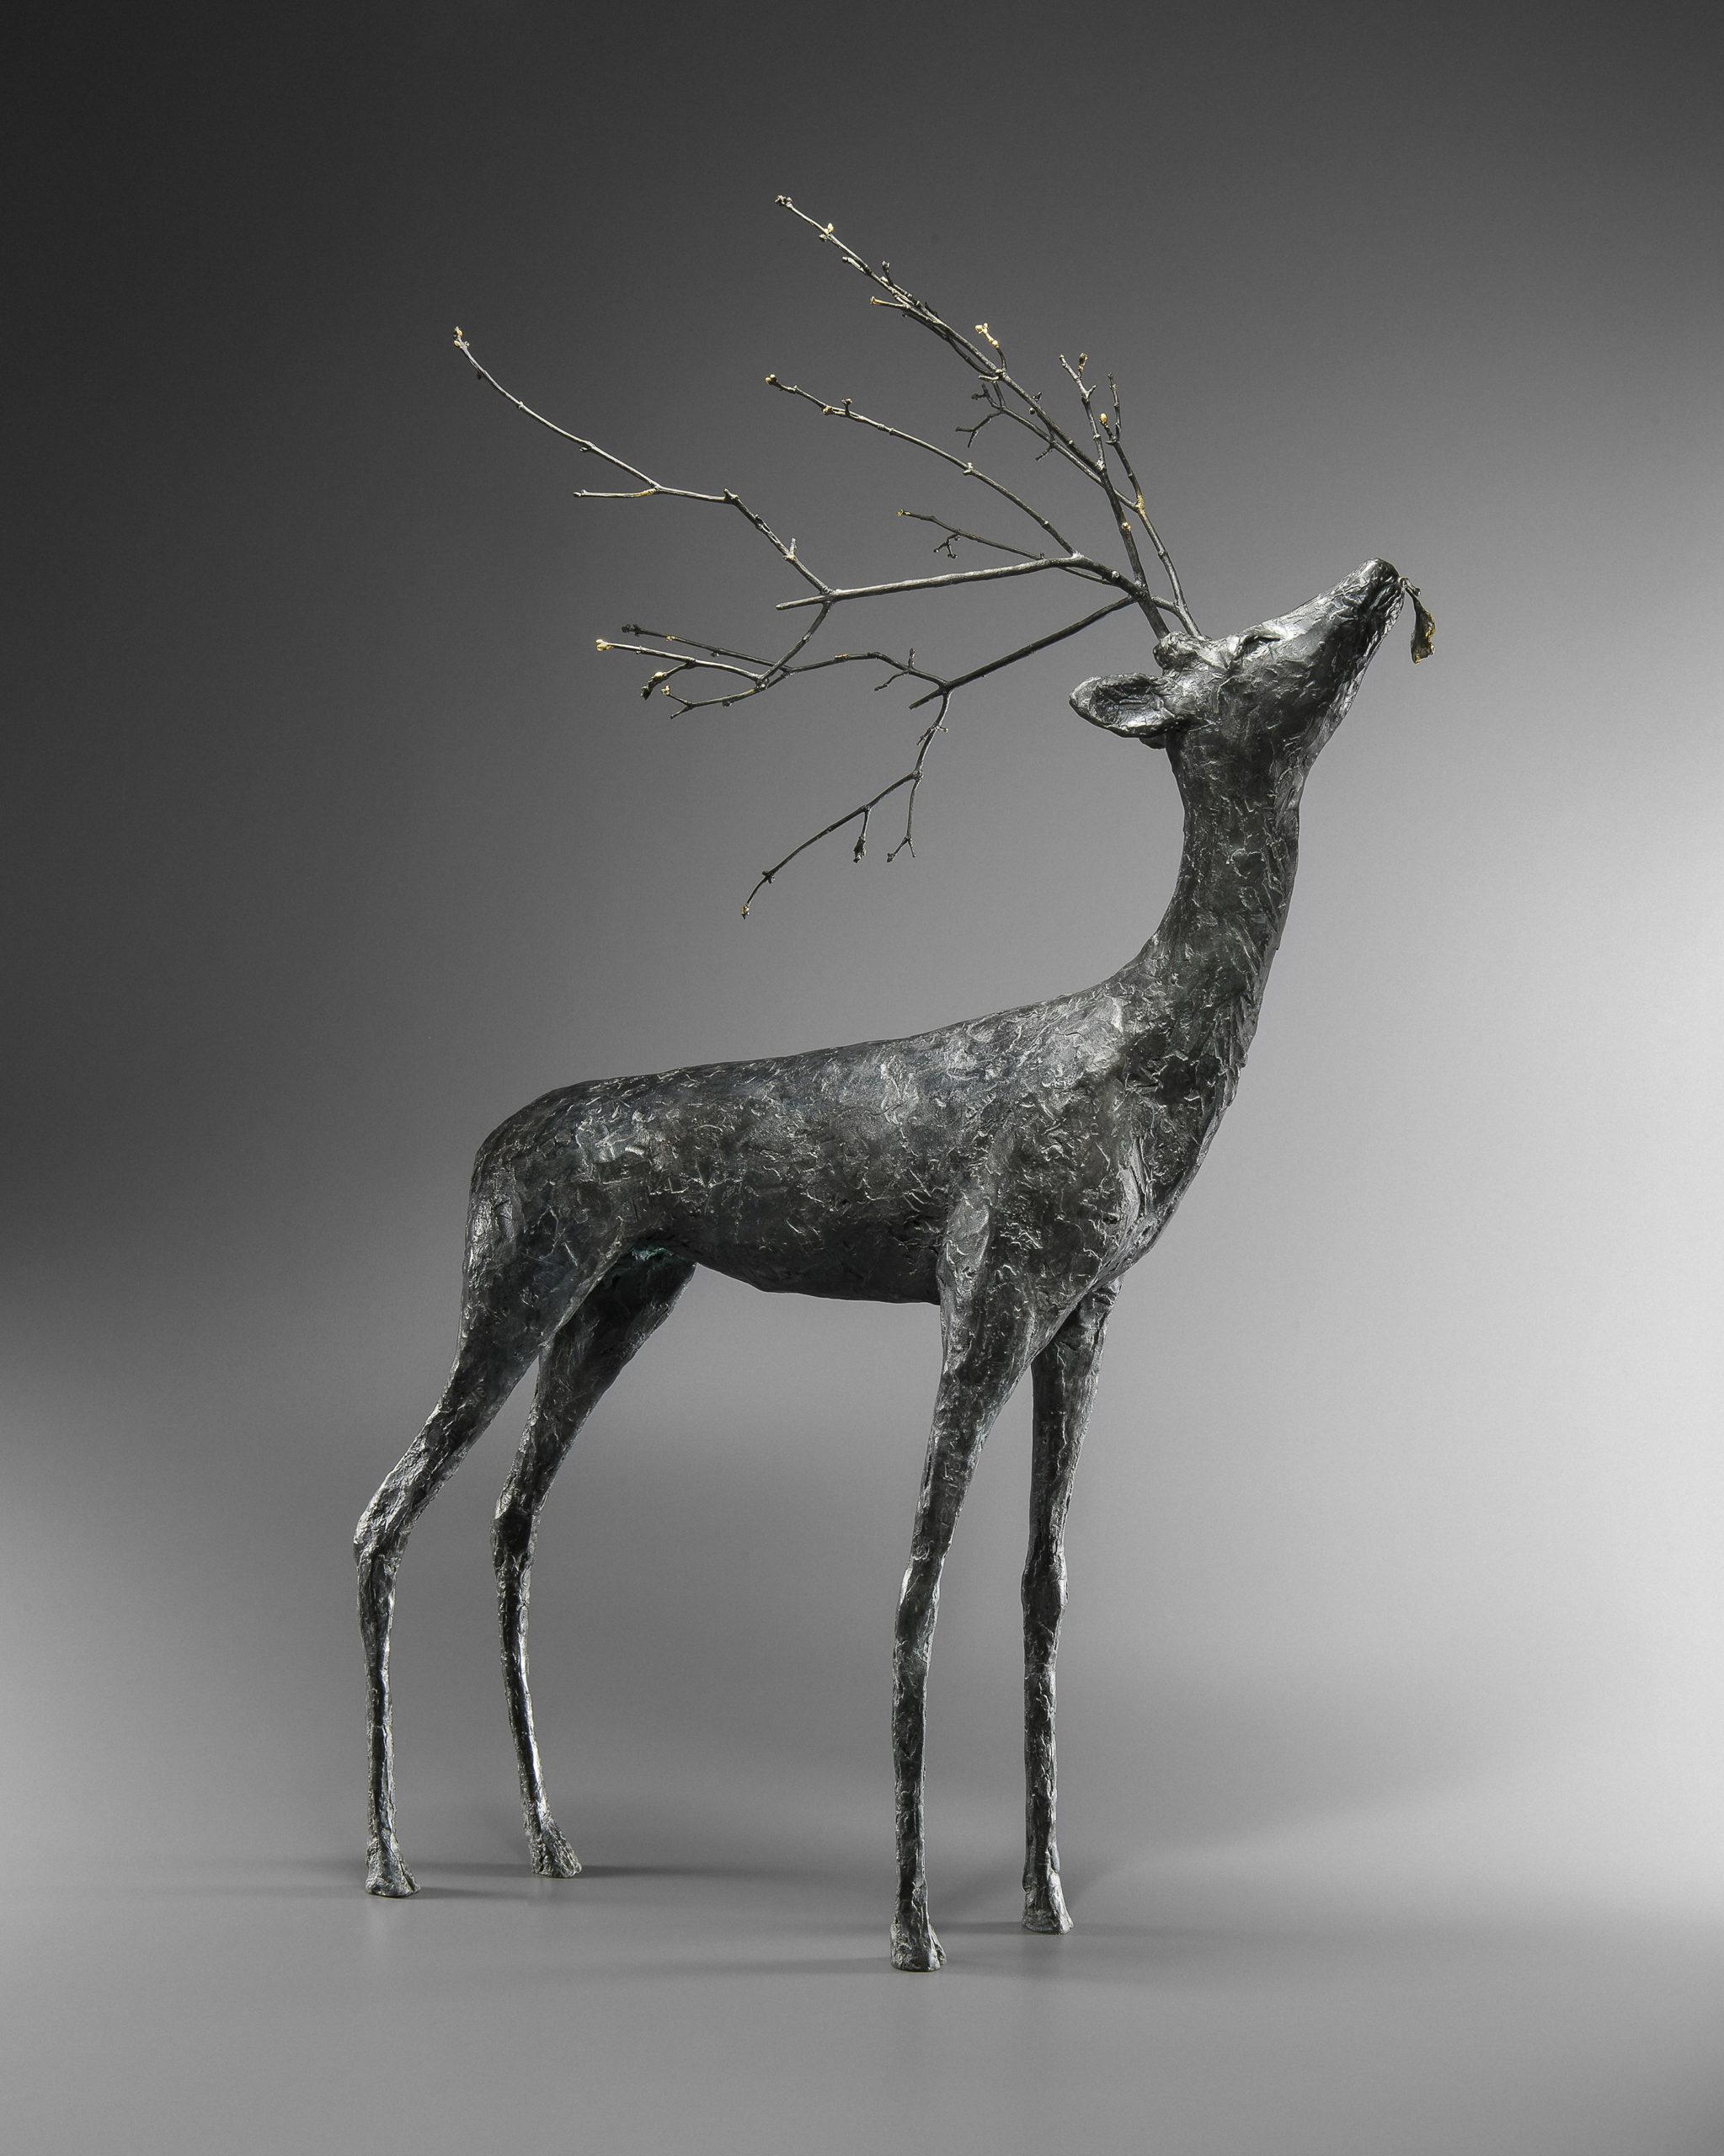 2-Guillemin-Jeune-cerf-H-galerie-bettina-art-contemporain-paris